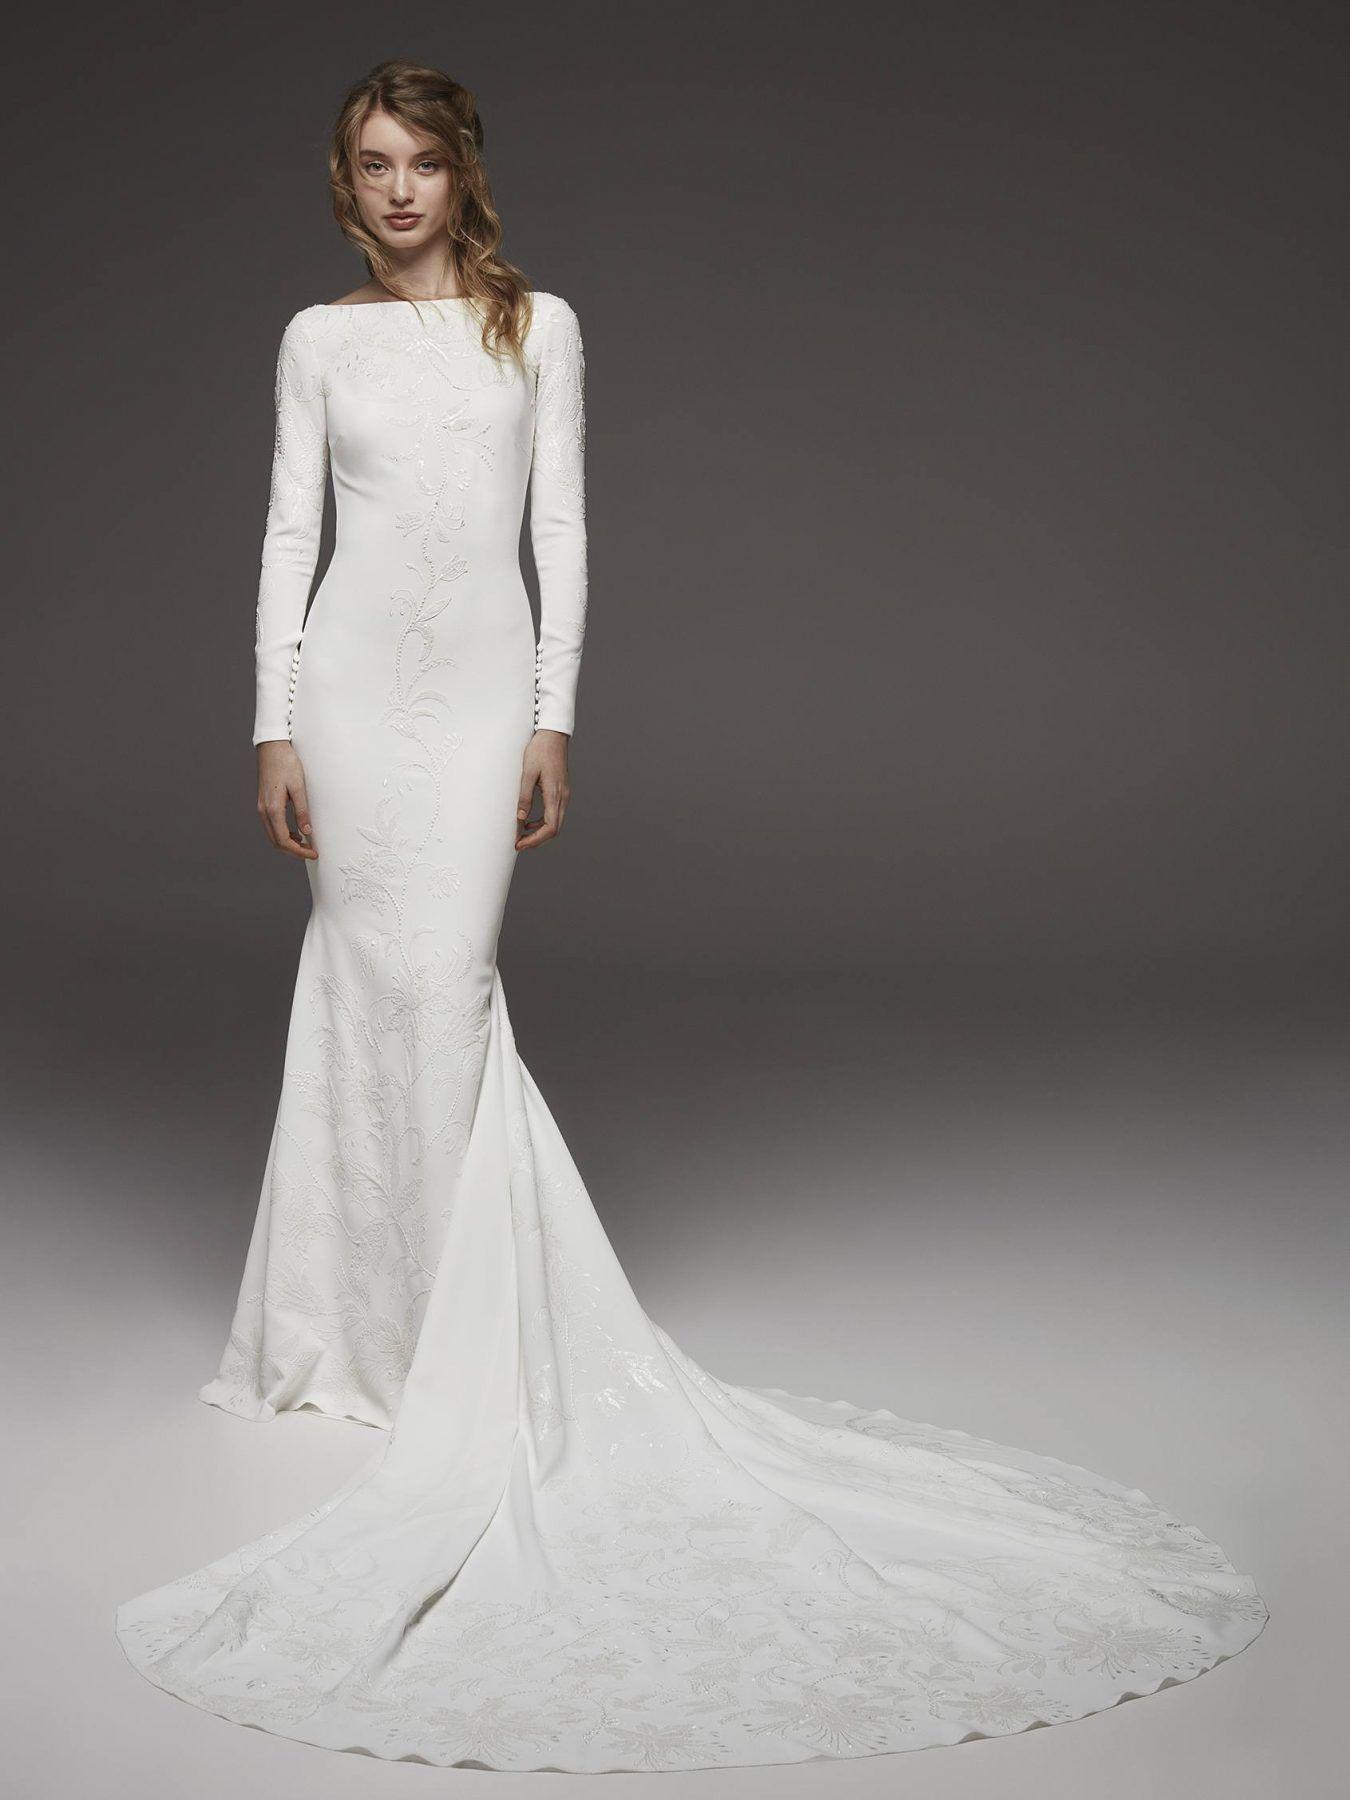 Bateau Neckline Long Sleeve Simply Elegant Wedding Dress By Pronovias Im Pronovias Wedding Dress Modest Long Sleeve Wedding Dresses Wedding Dresses Kleinfeld [ 1800 x 1350 Pixel ]